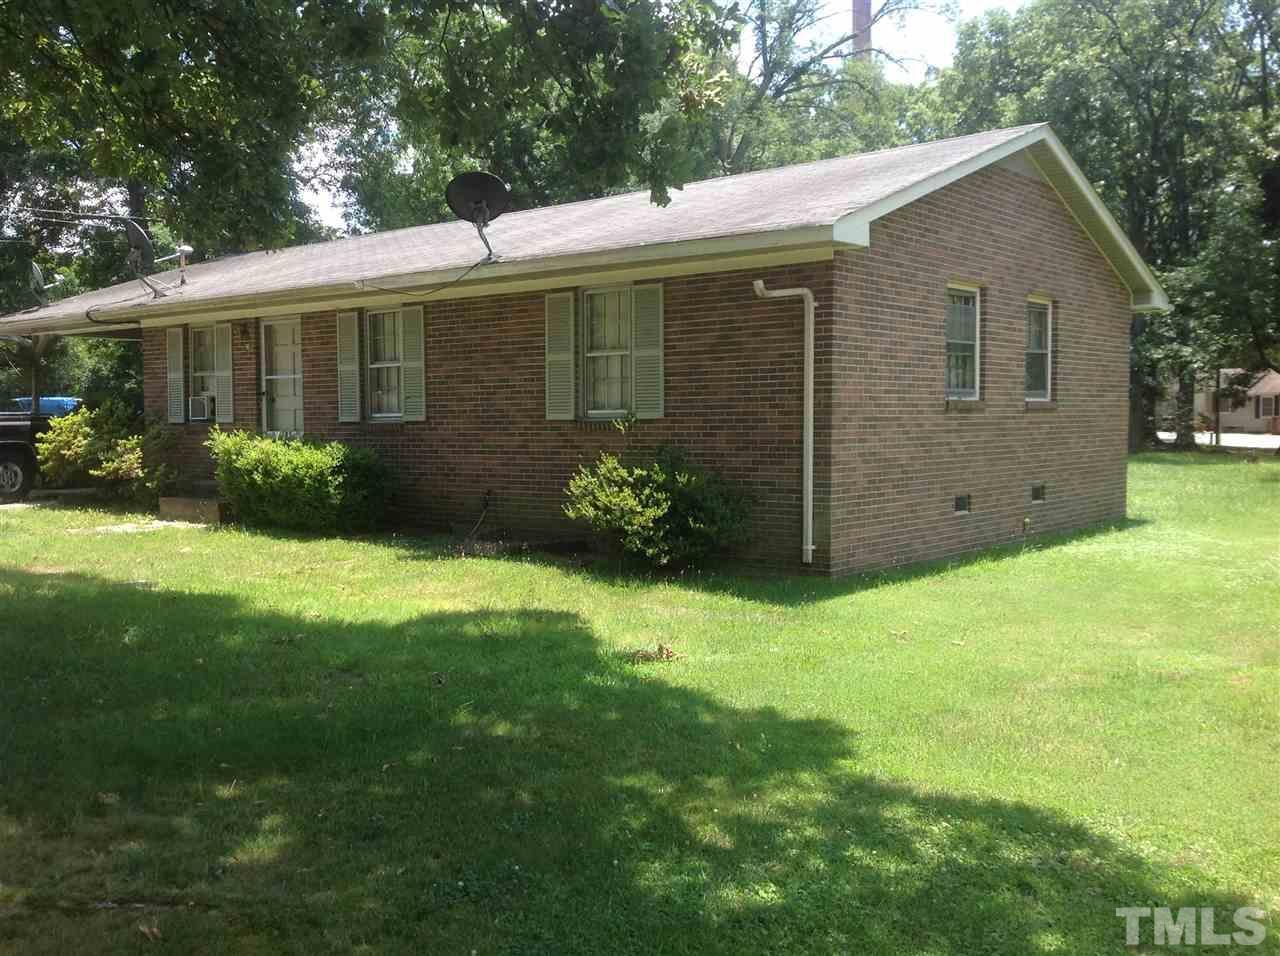 119 Shady Hill Cir, Roxboro, NC